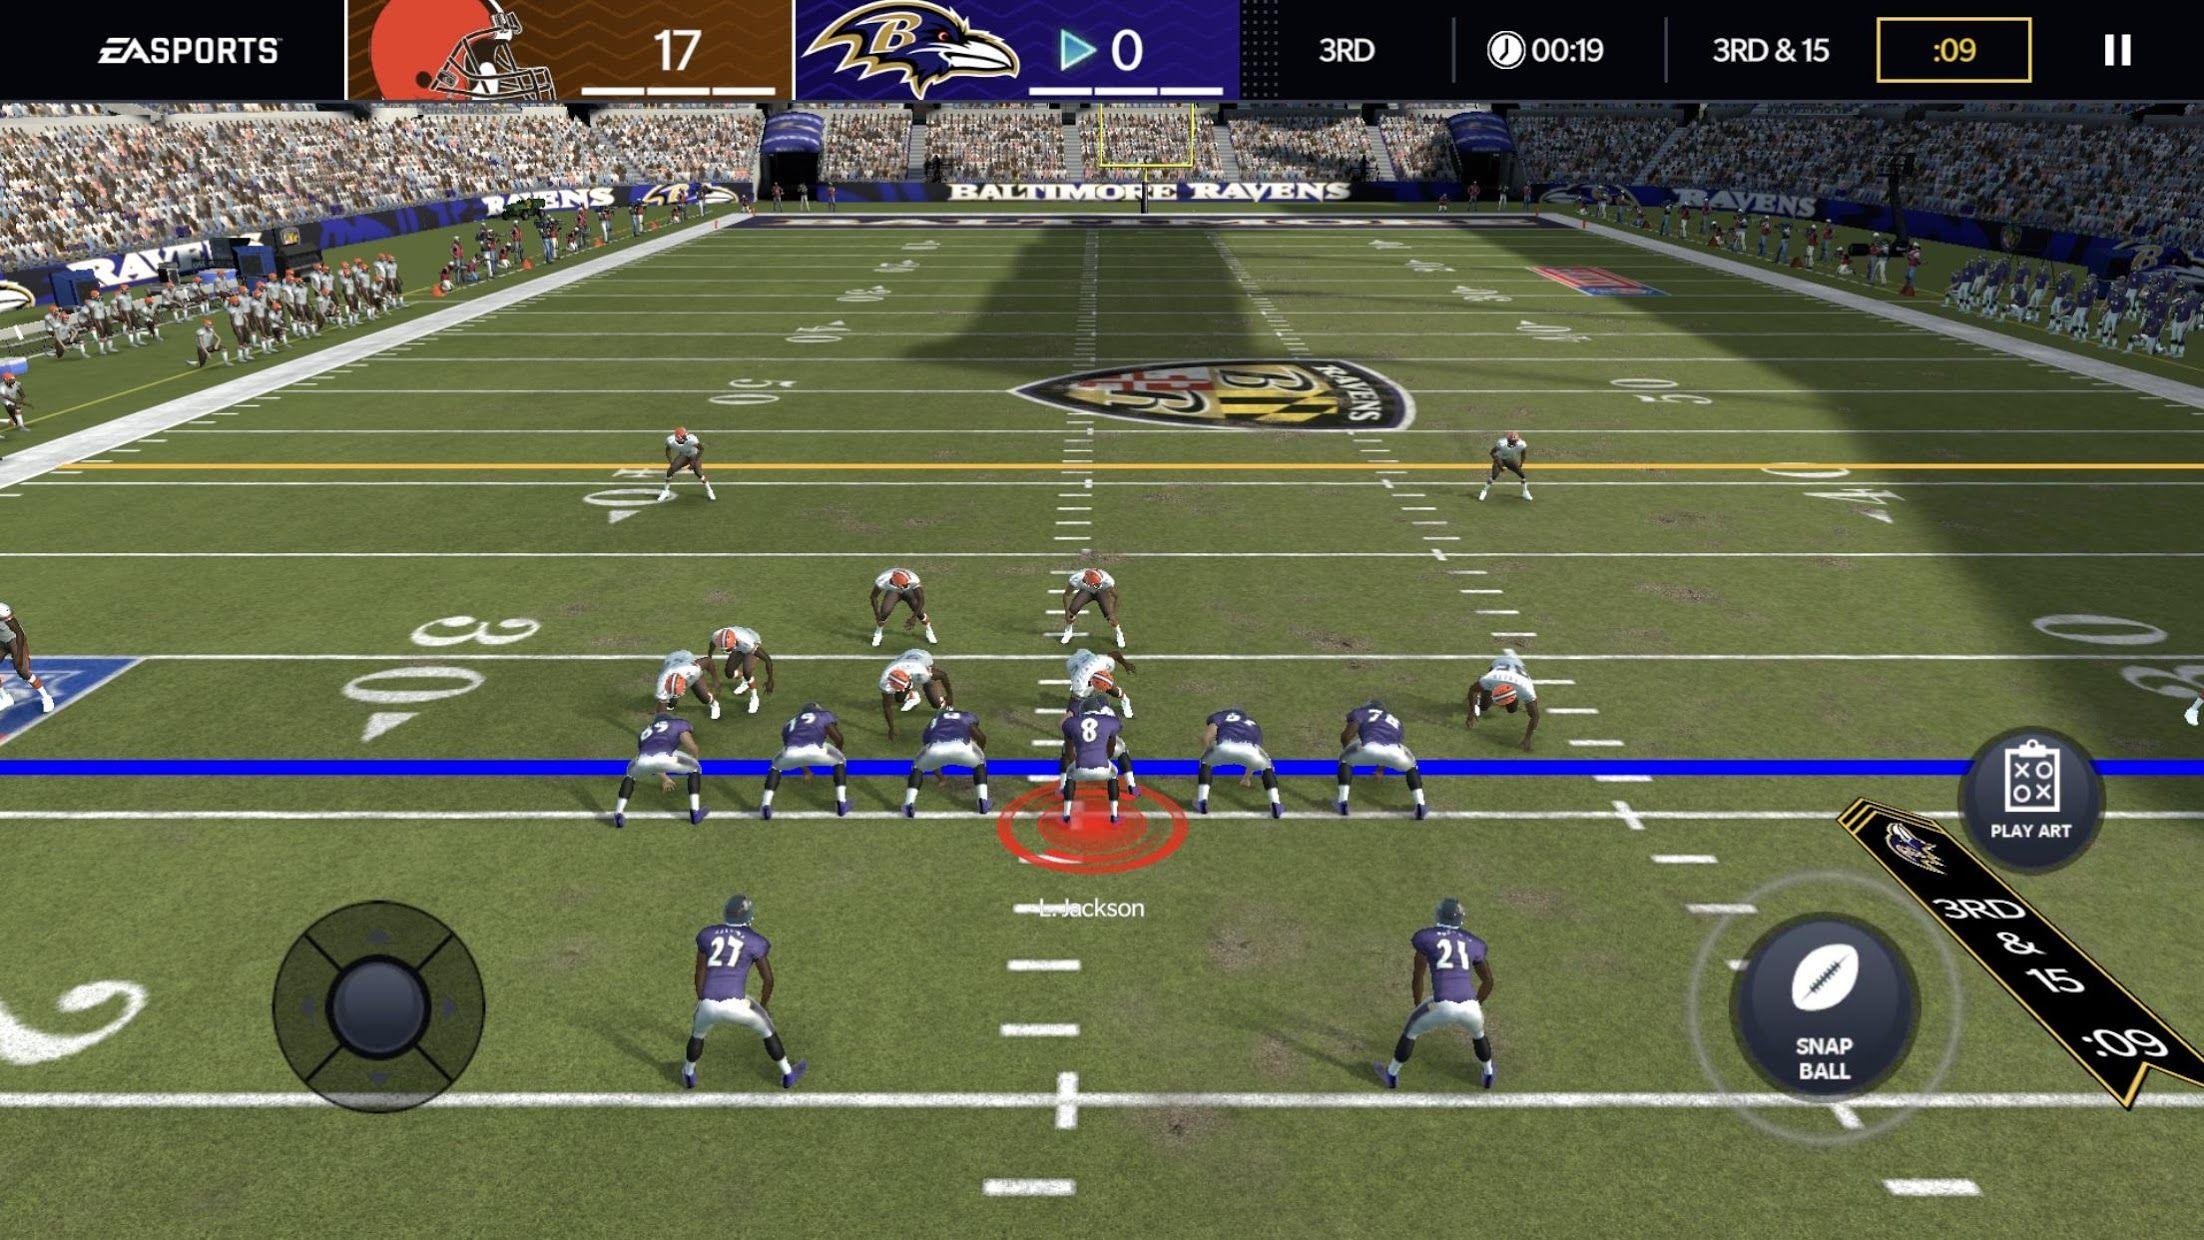 《Madden NFL 21 Mobile》橄榄球 游戏截图5